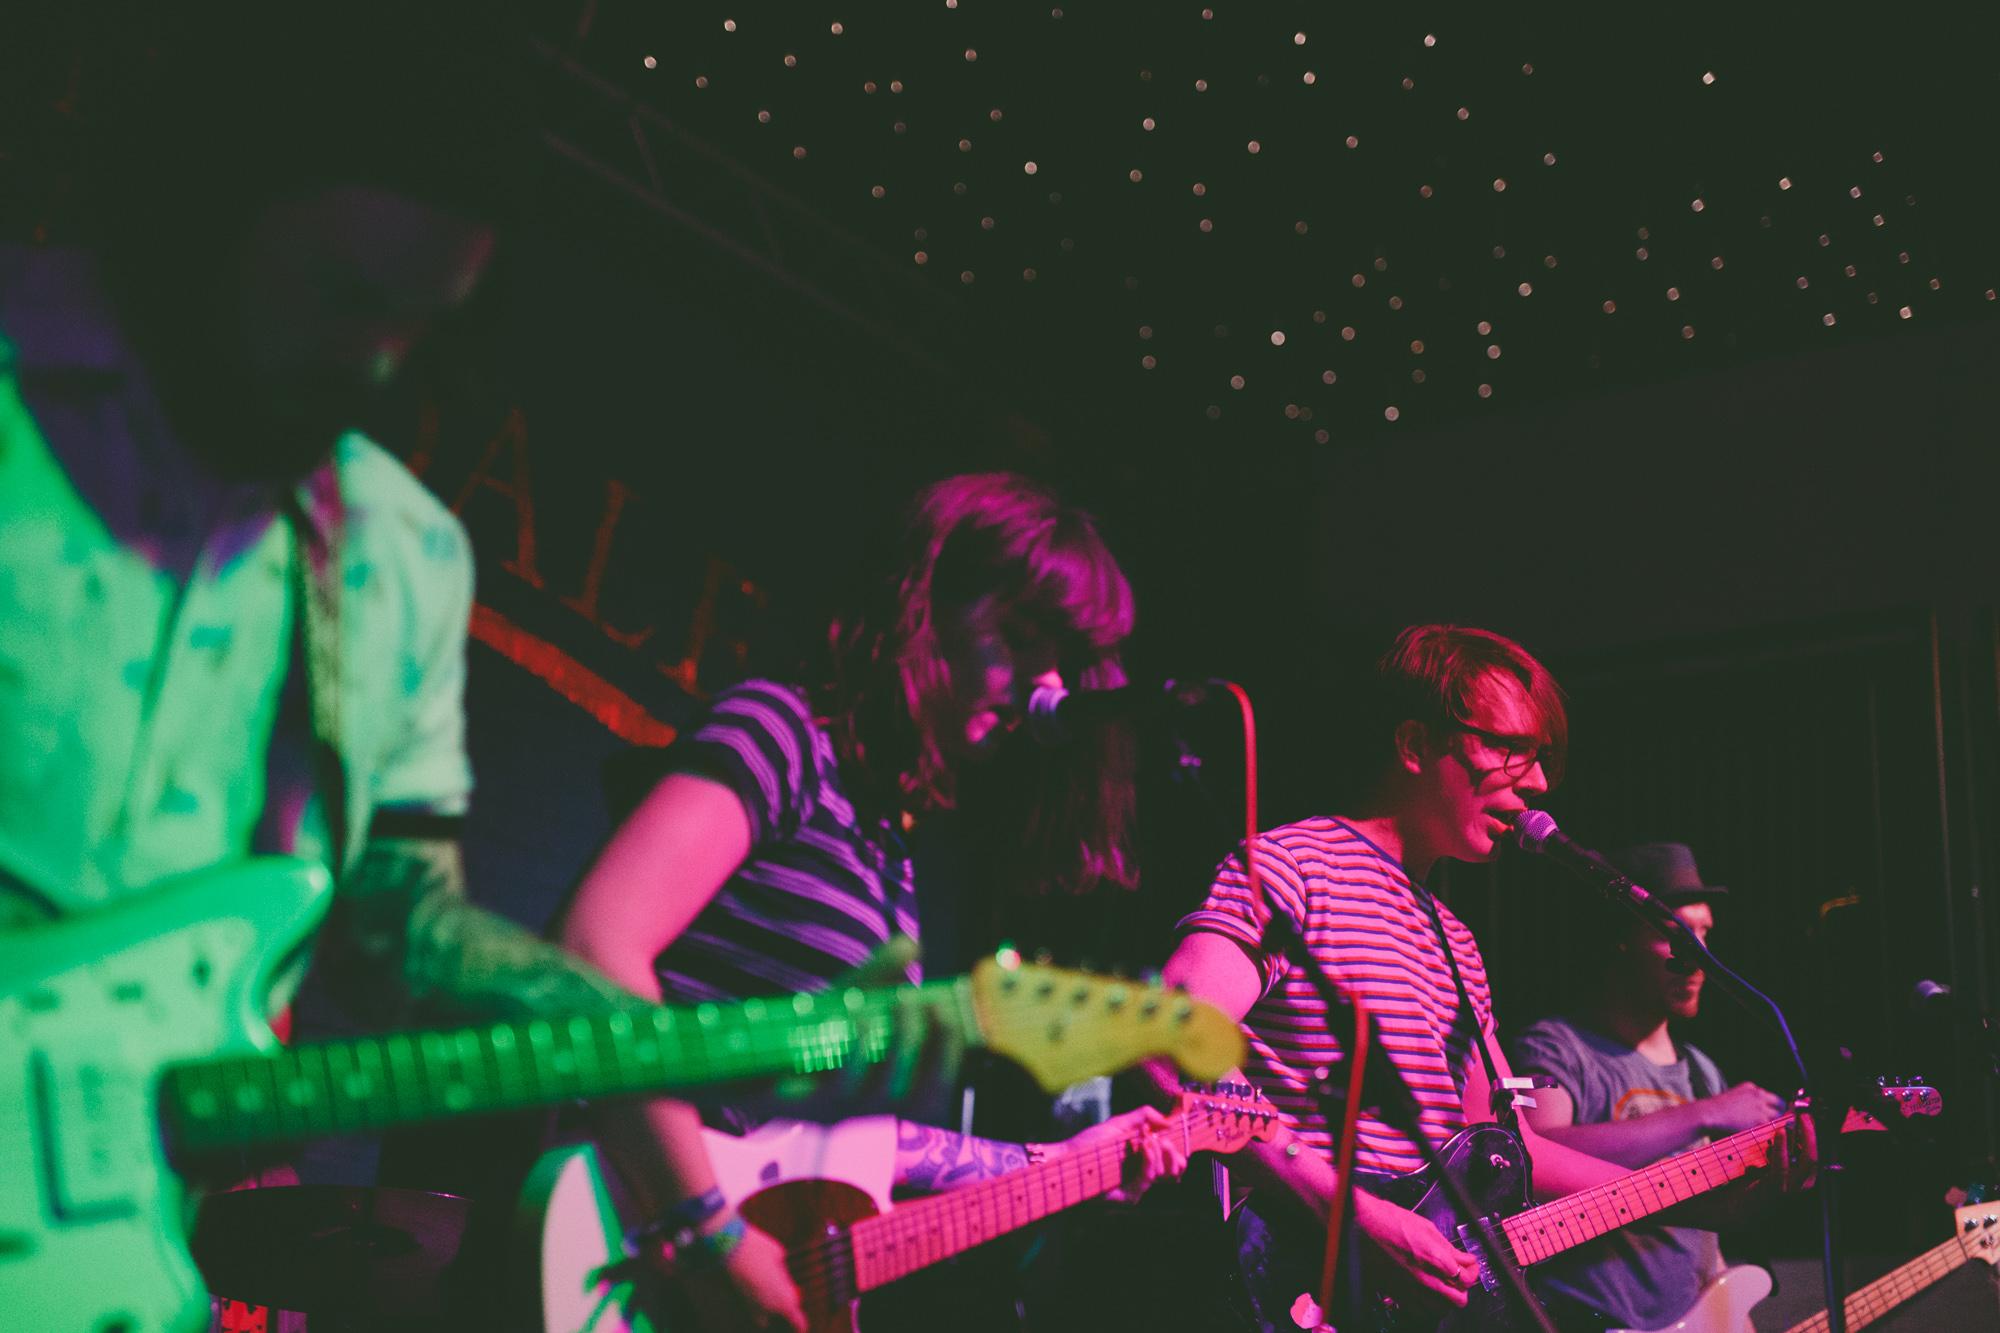 live-music-photography-london-uk-johnny-foreigner-camden-24.jpg